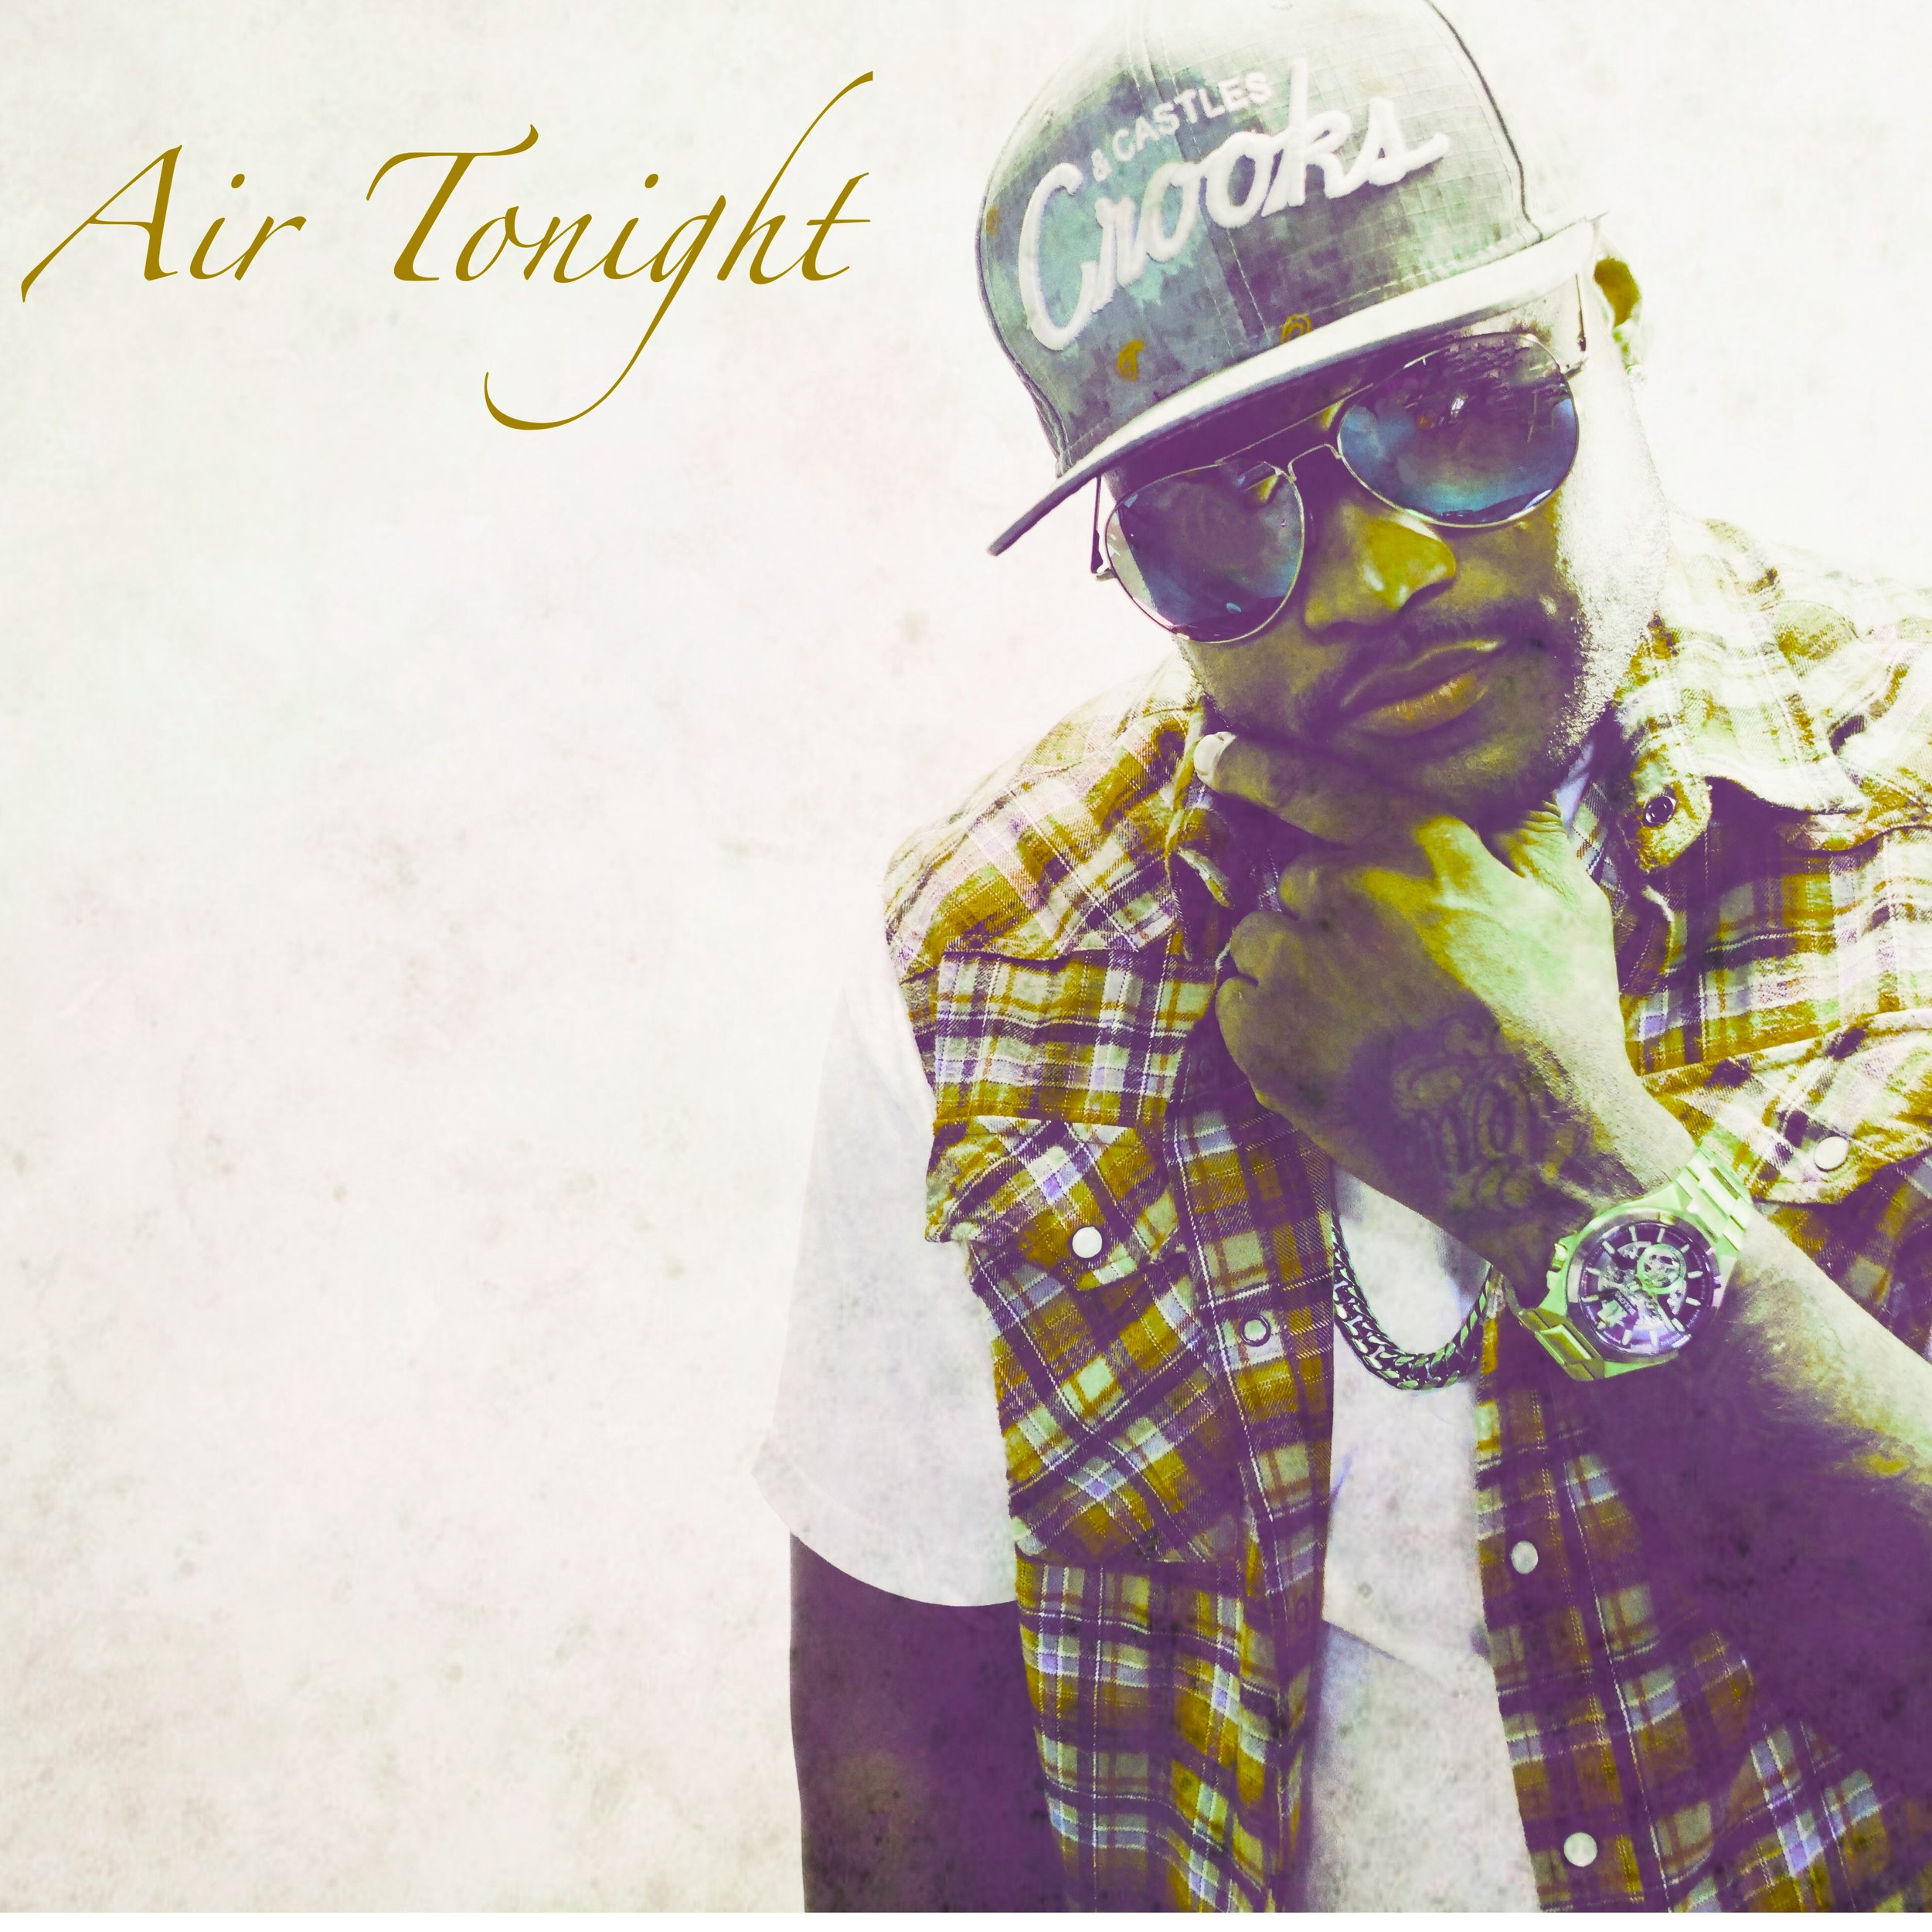 AIR TONIGHT 2.jpg